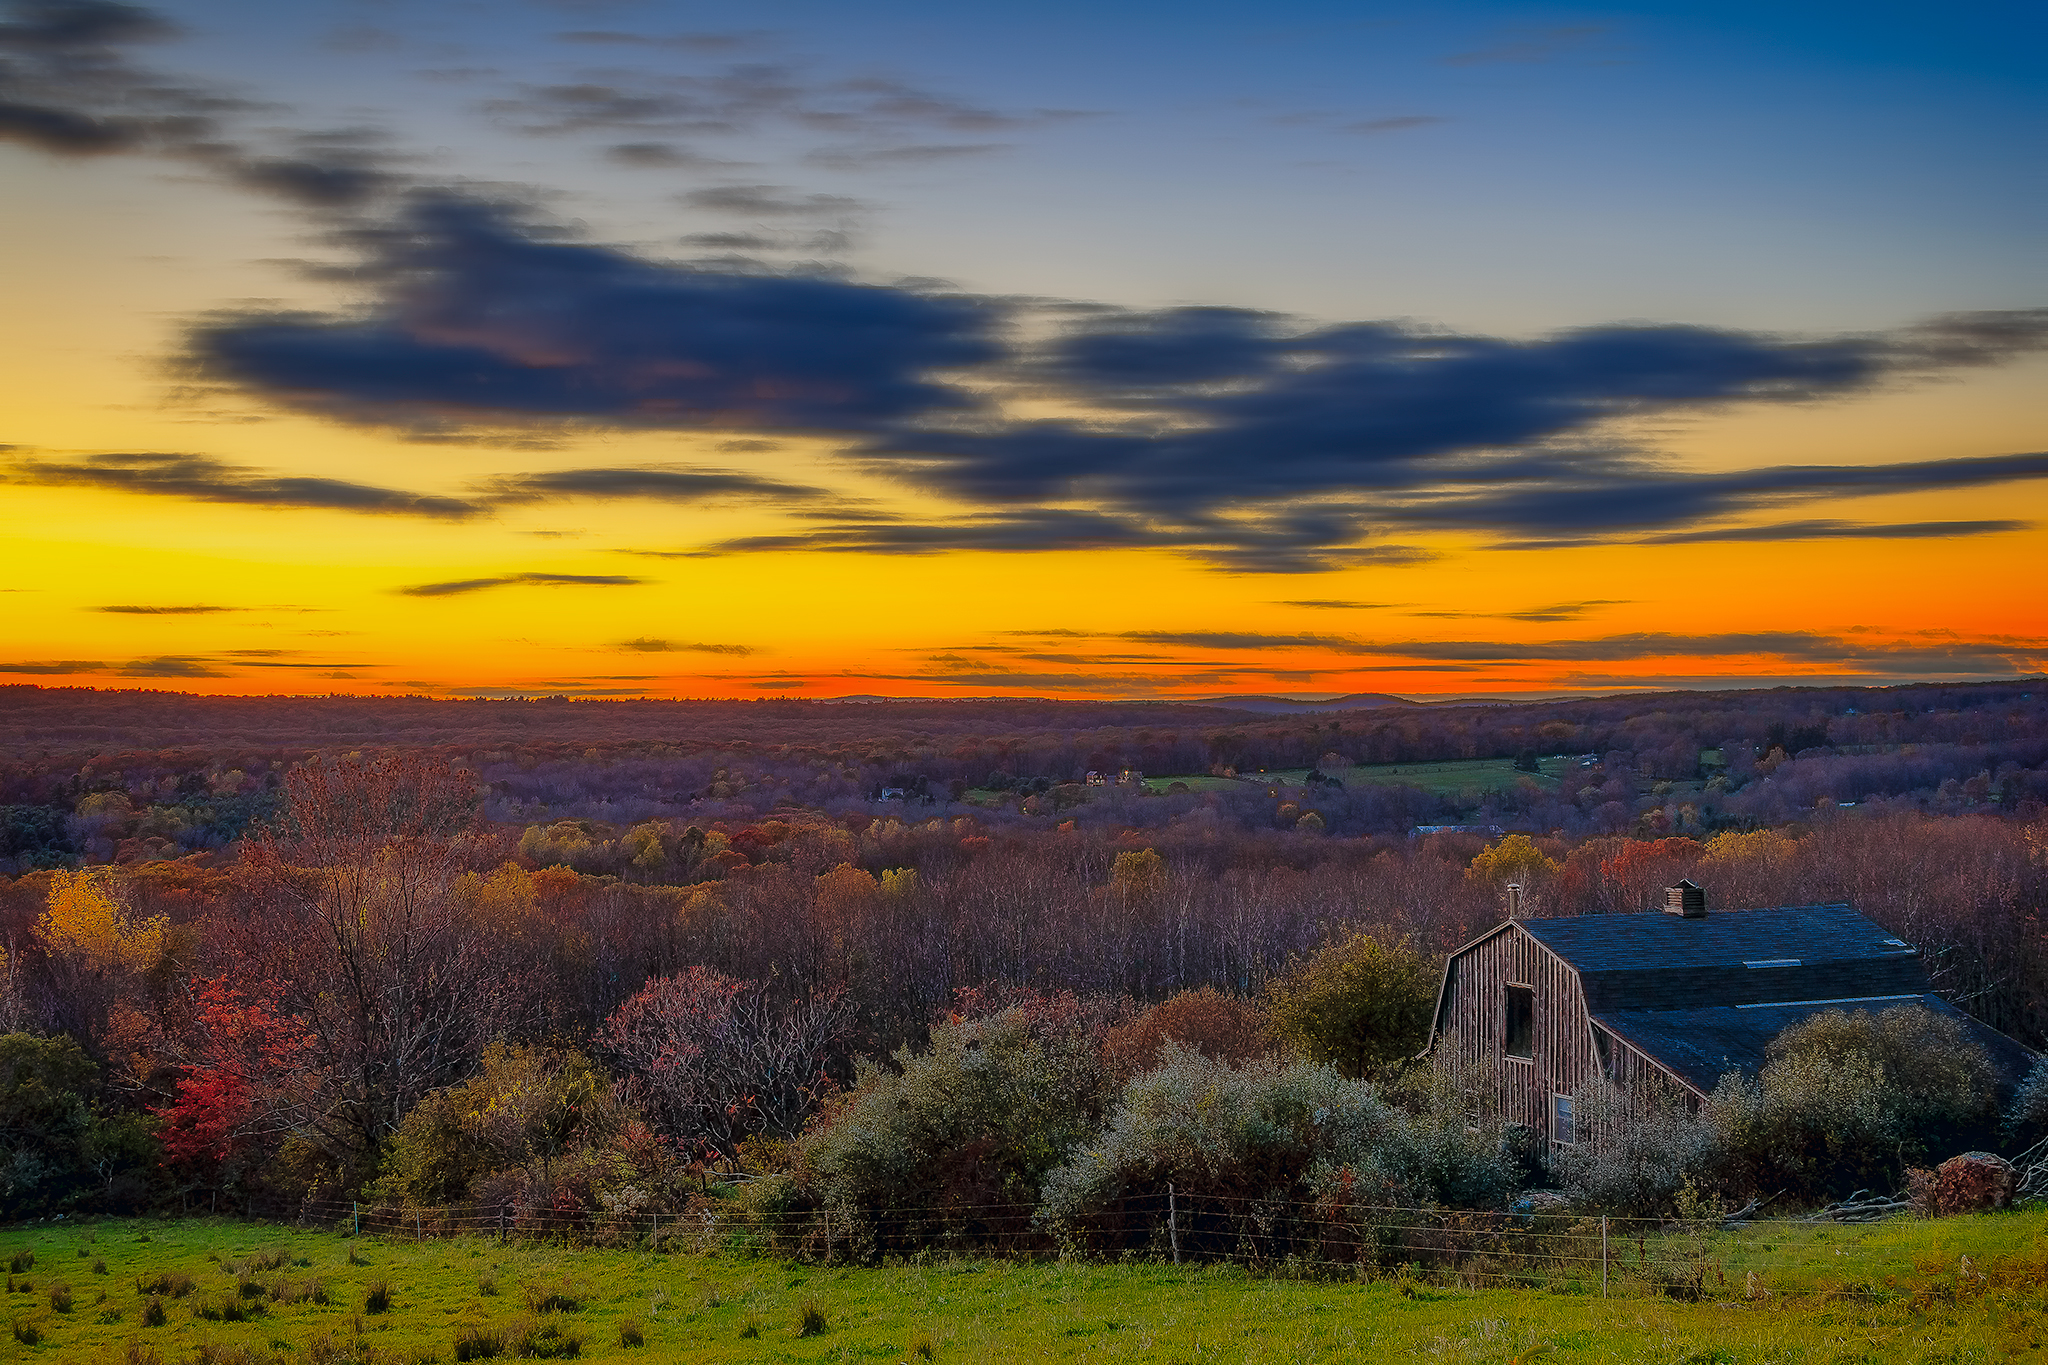 Taken in Morris, Connecticut, USA.